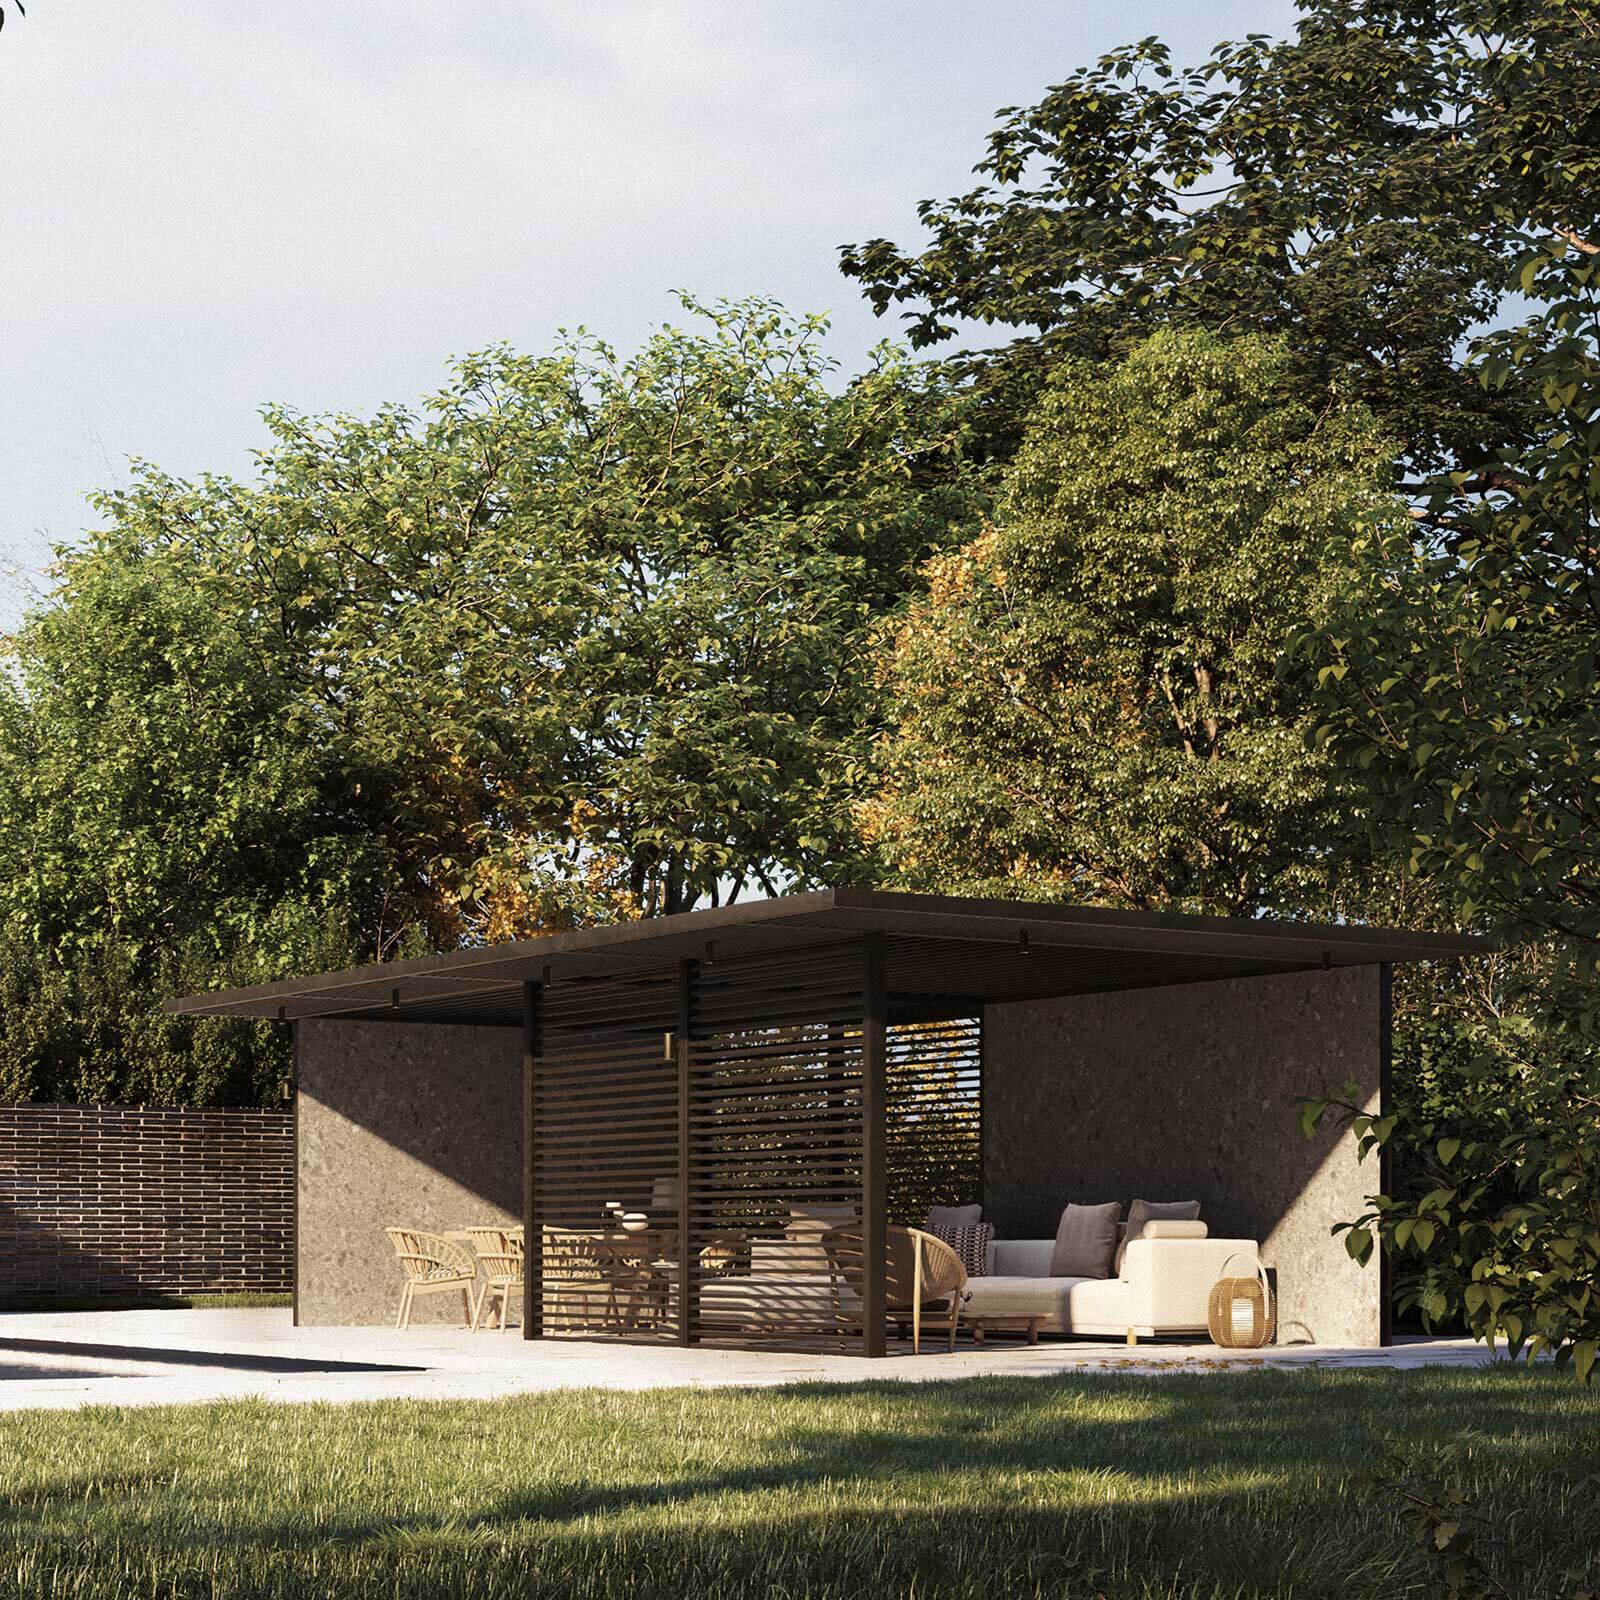 pavilion_H_belgium_house_ceppo_stone__SQ.jpg